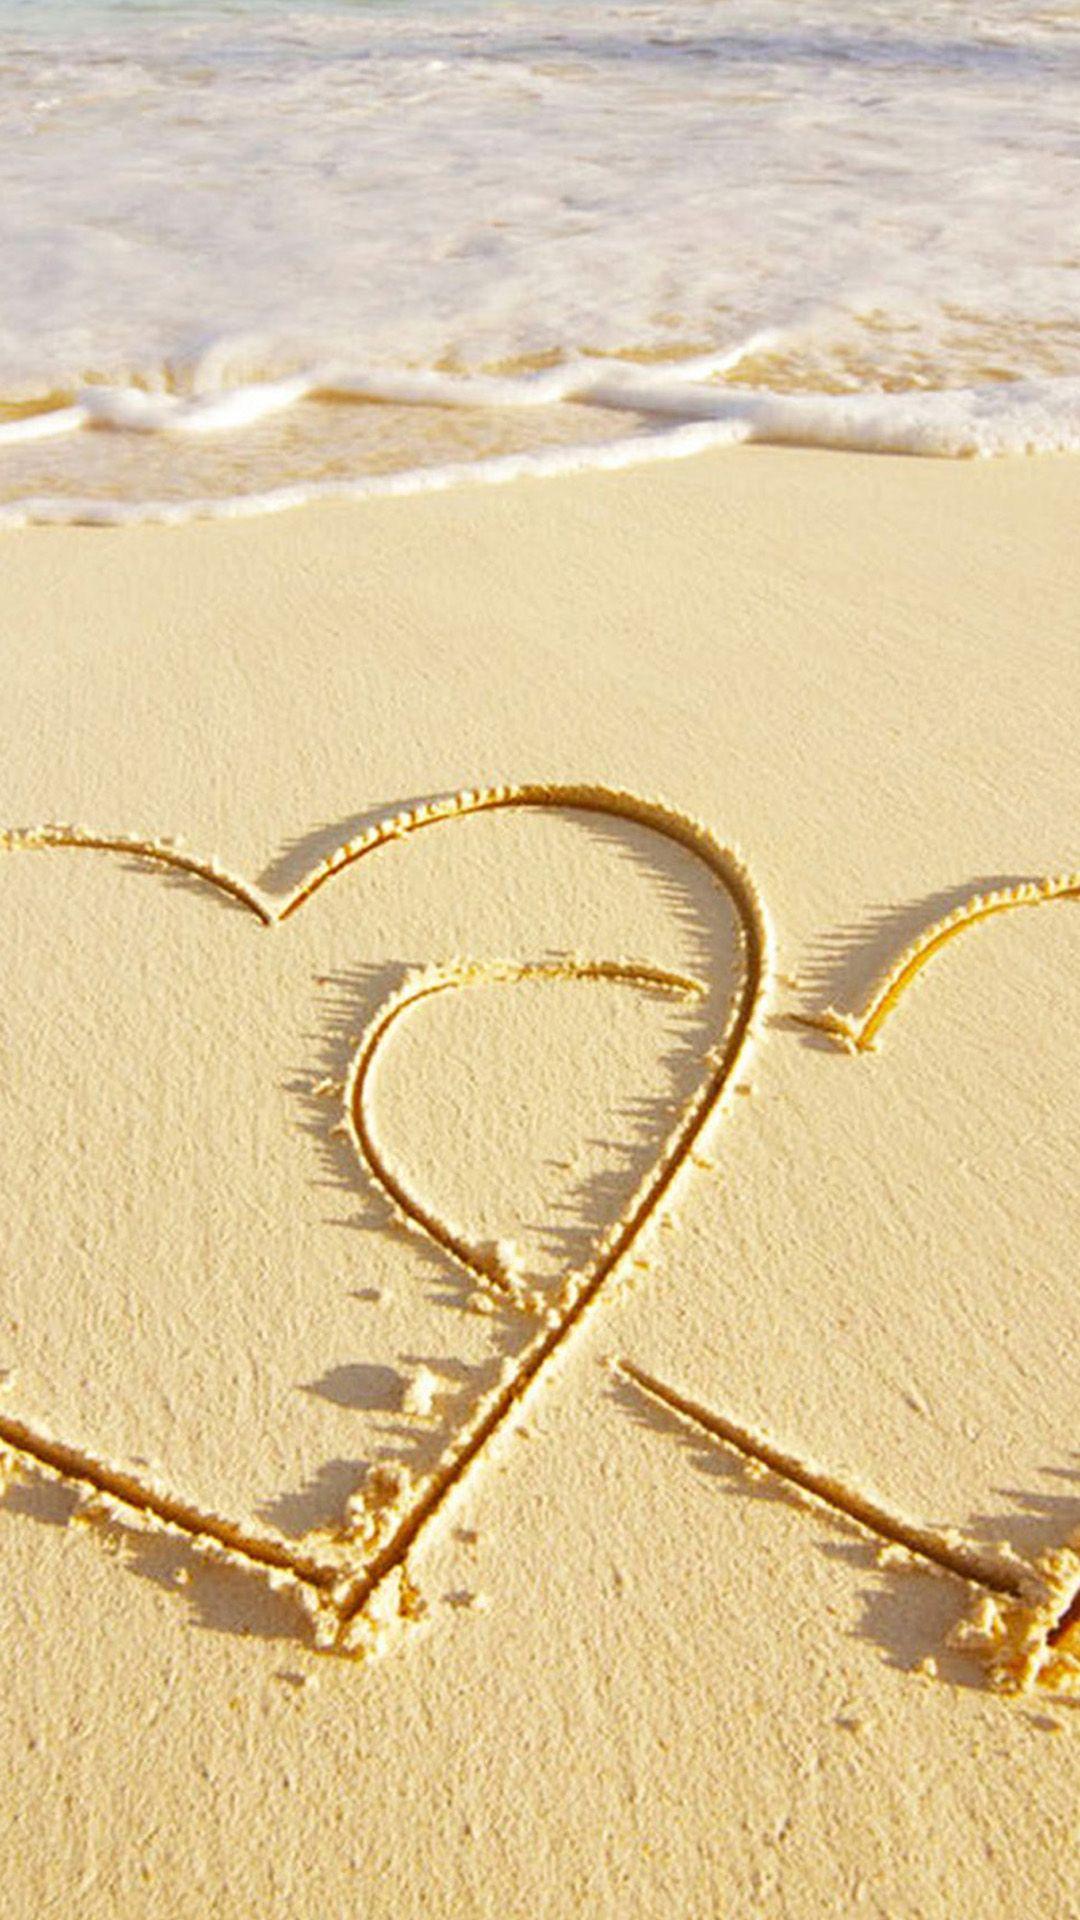 Must see Wallpaper Love Iphone 6 Plus - 03d4ea75c431b177eb79fa1bcdd7e735  HD_511434.jpg